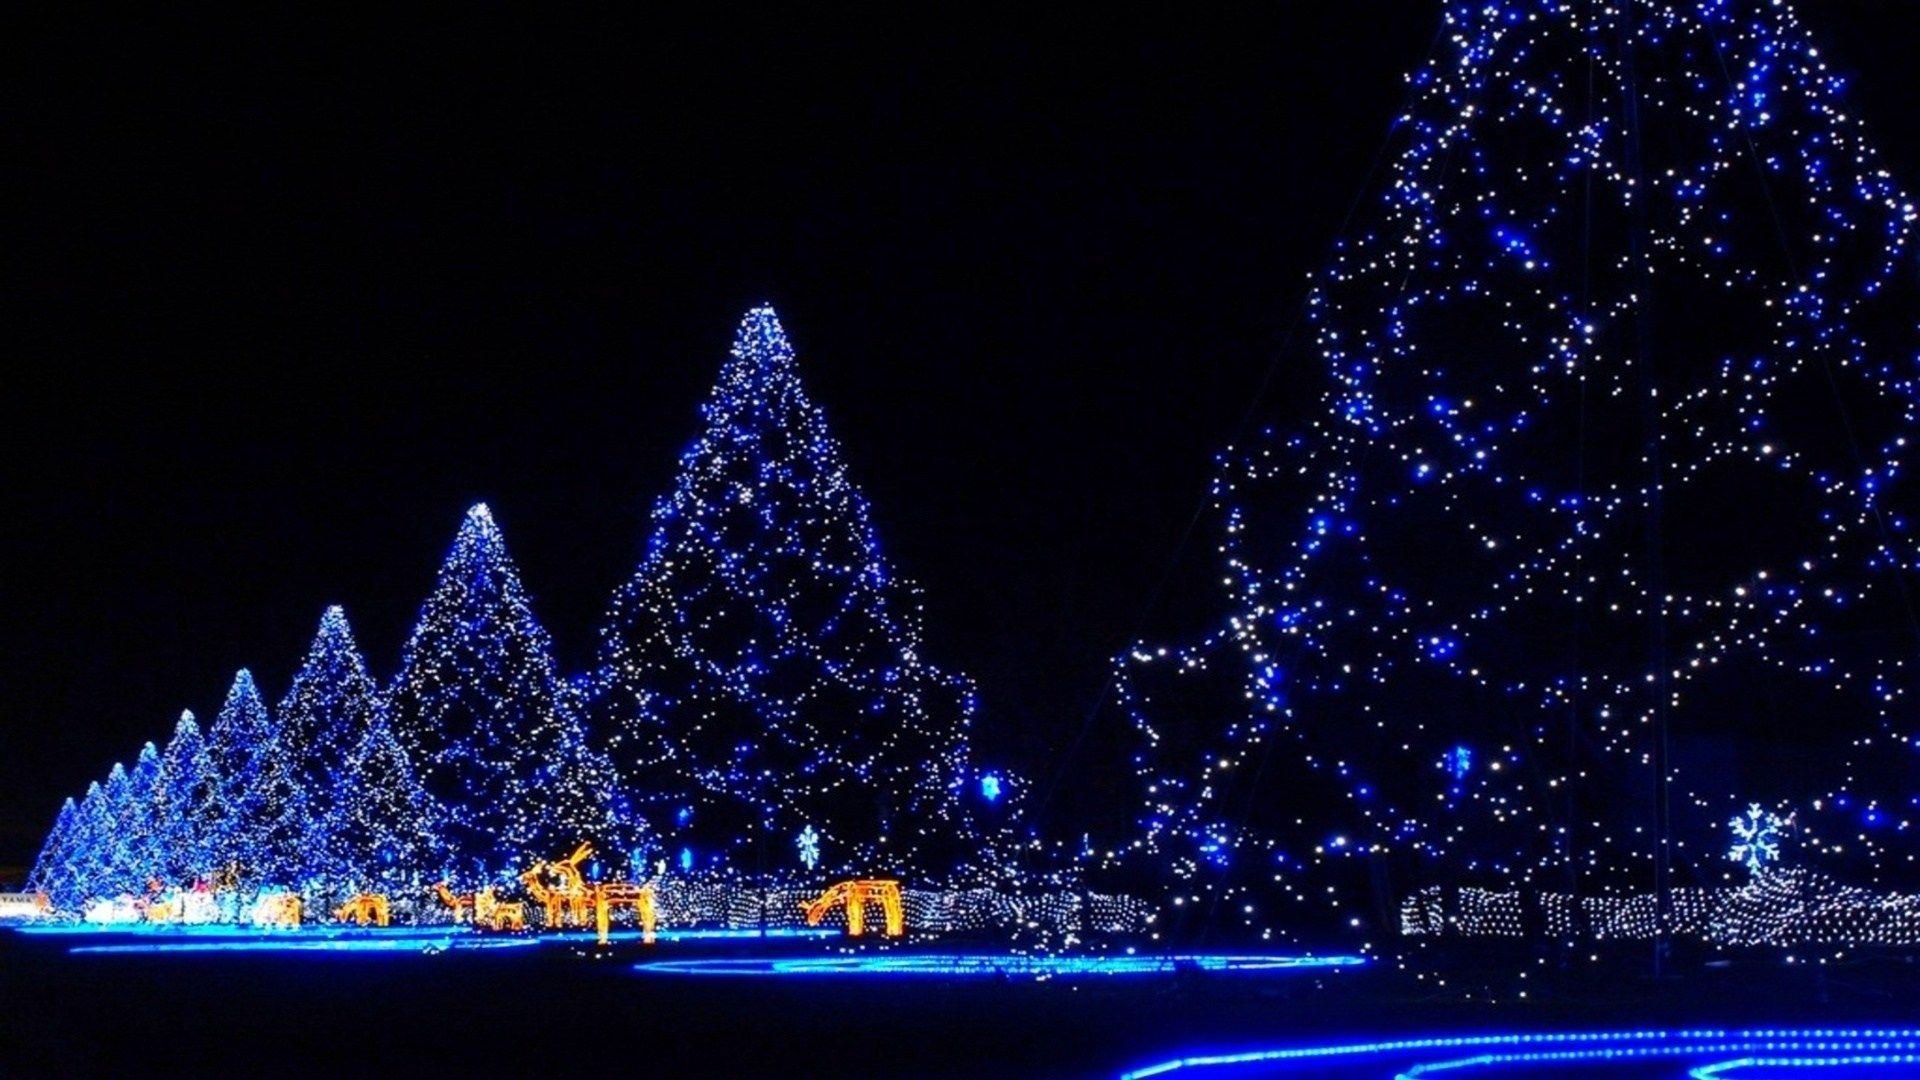 Christmas Tree hd wallpaper 1080